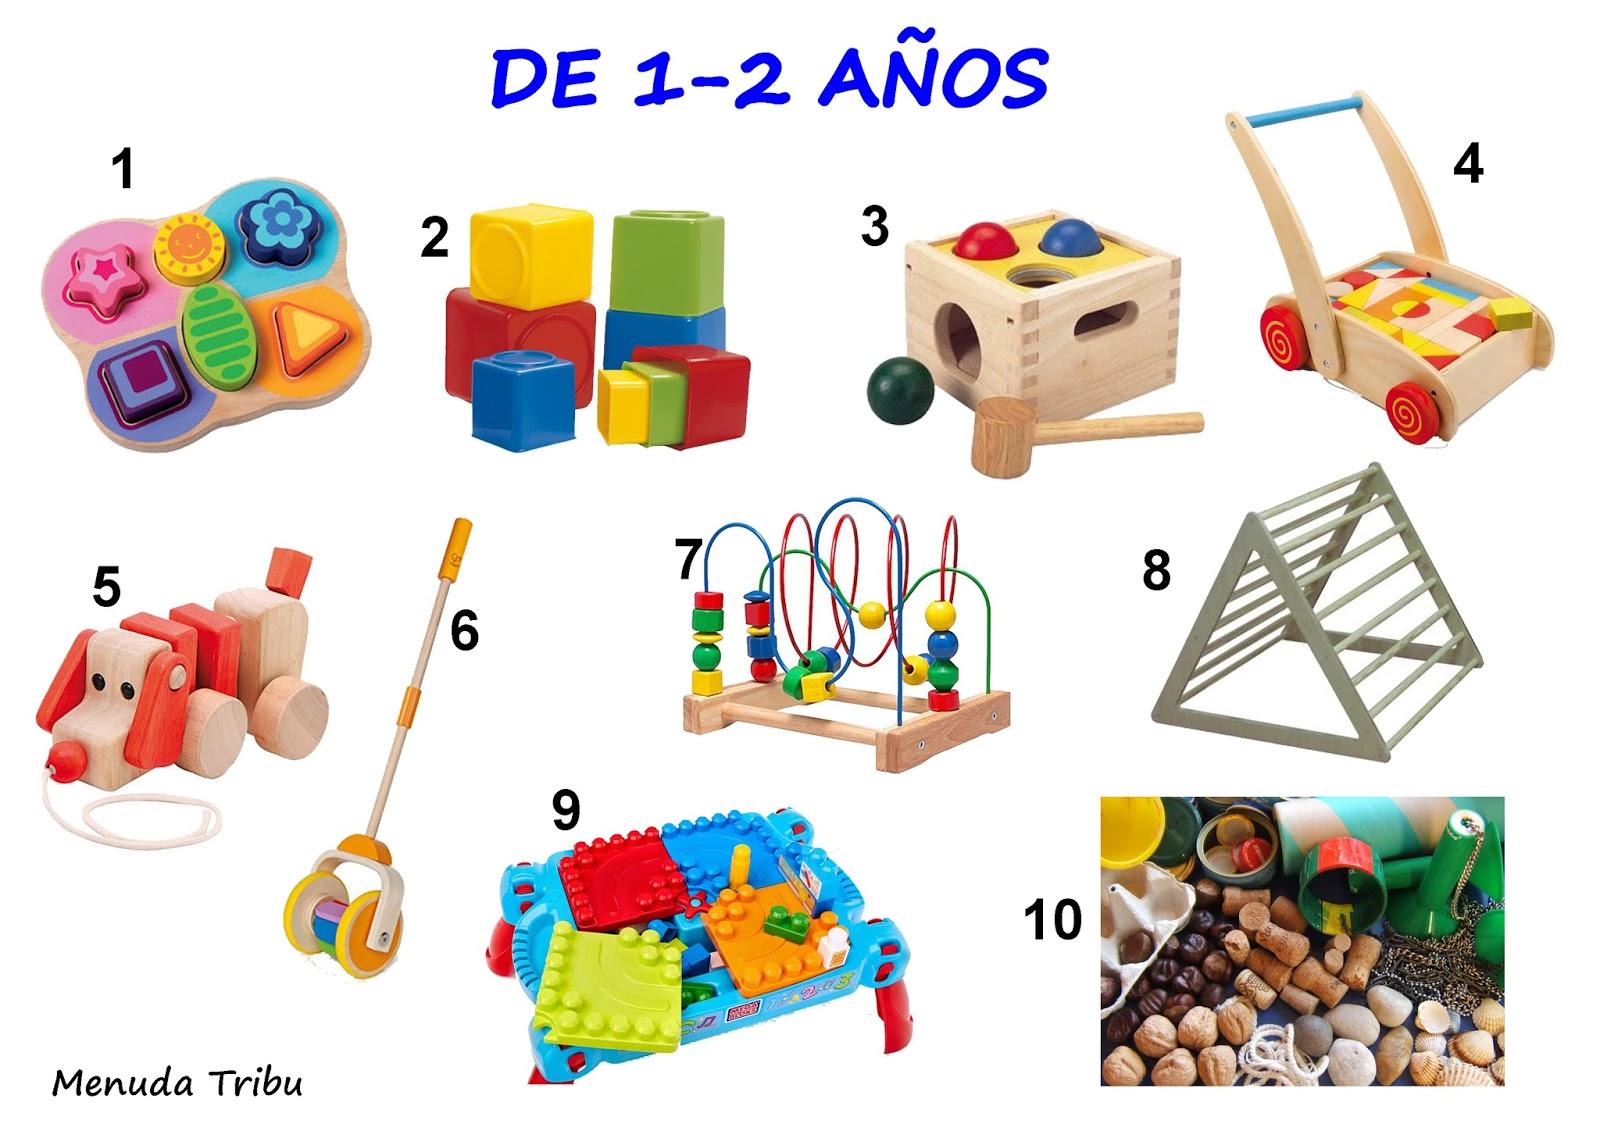 Menuda tribu ideas de juguetes para ni os de 0 a 4 a os - Juguetes para ninos de 3 a 4 anos ...